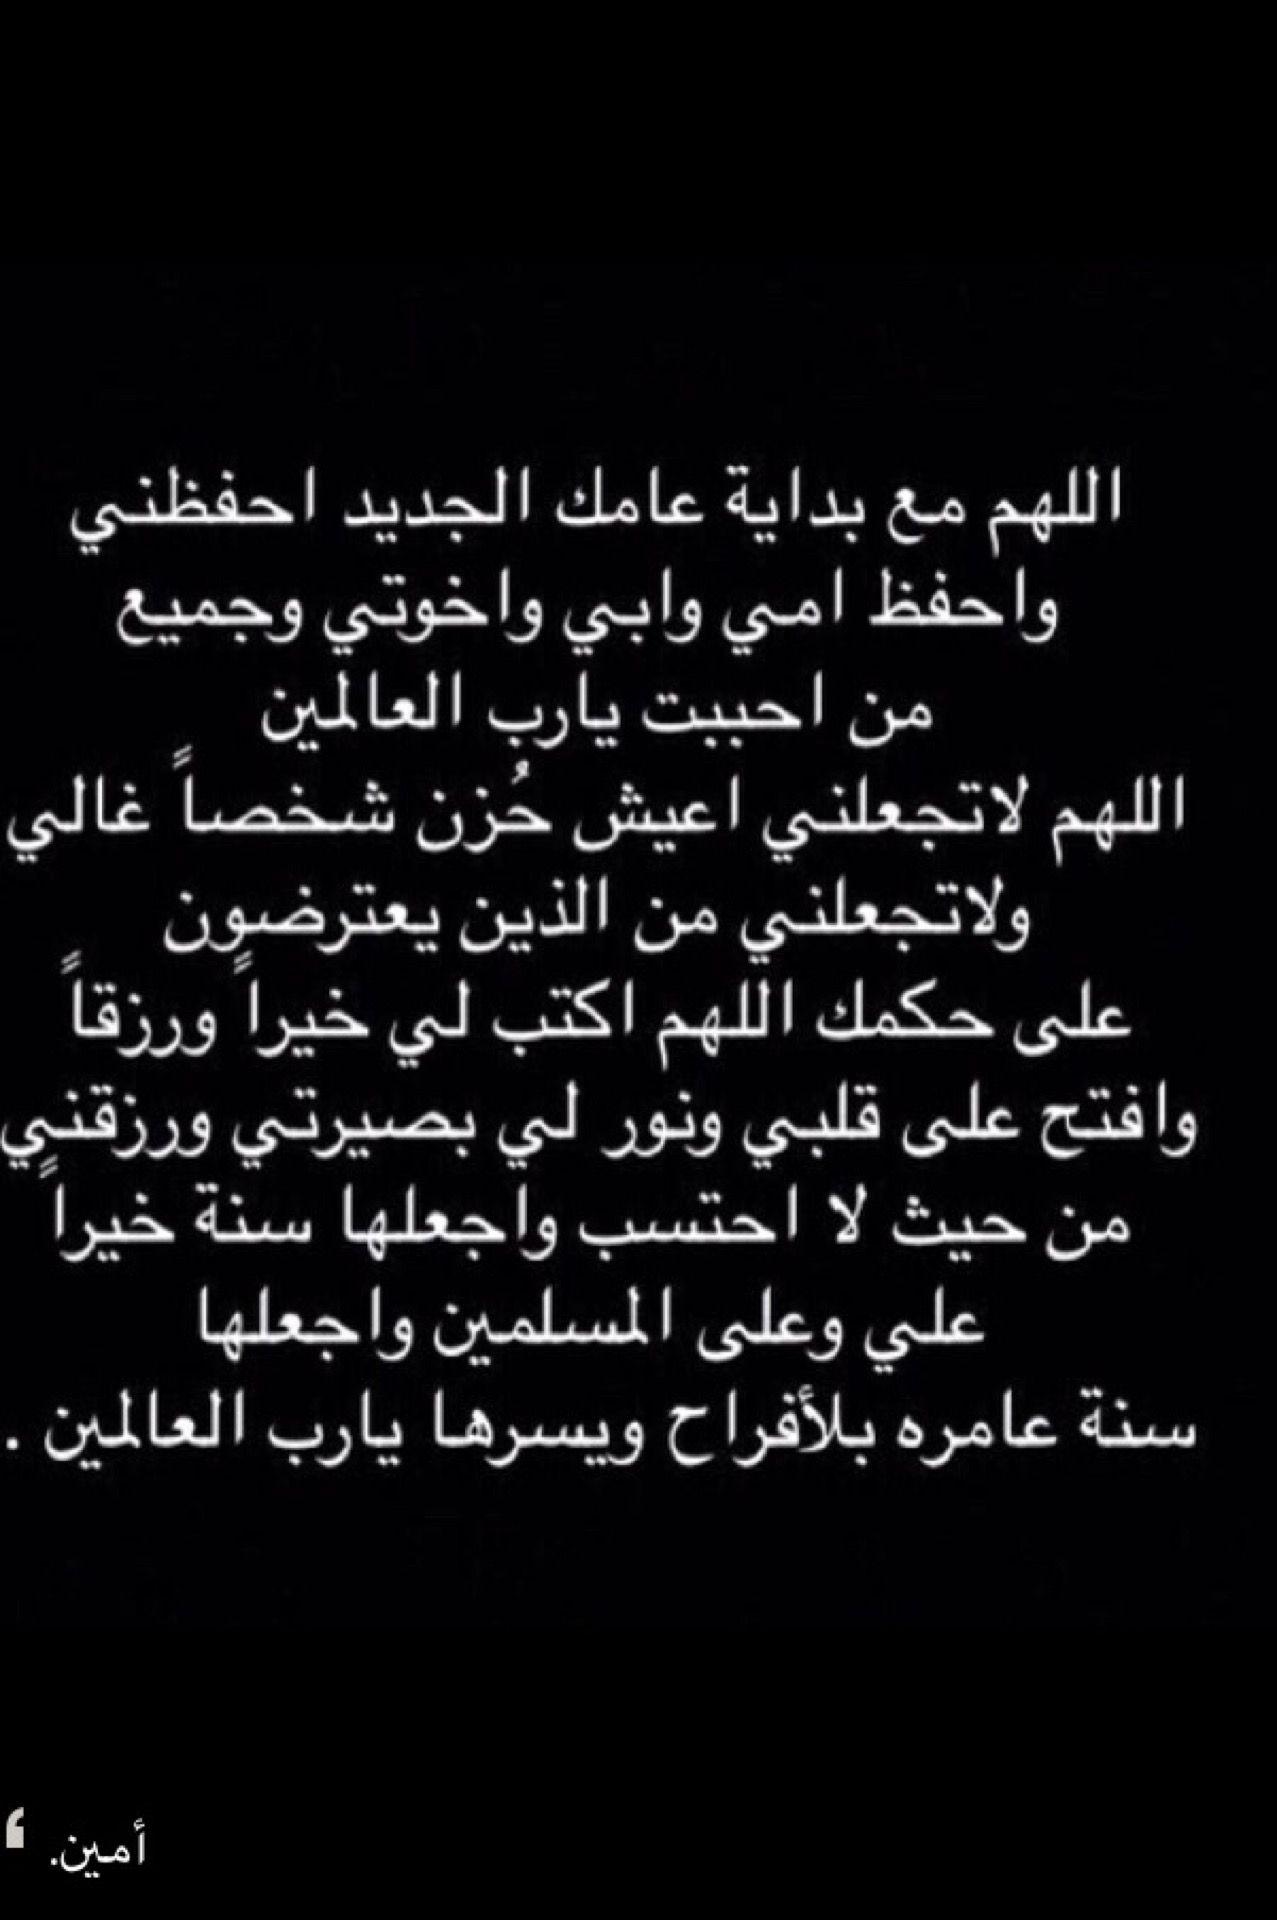 Riyadh الرياض Words Quotes Funny Words Quran Quotes Love